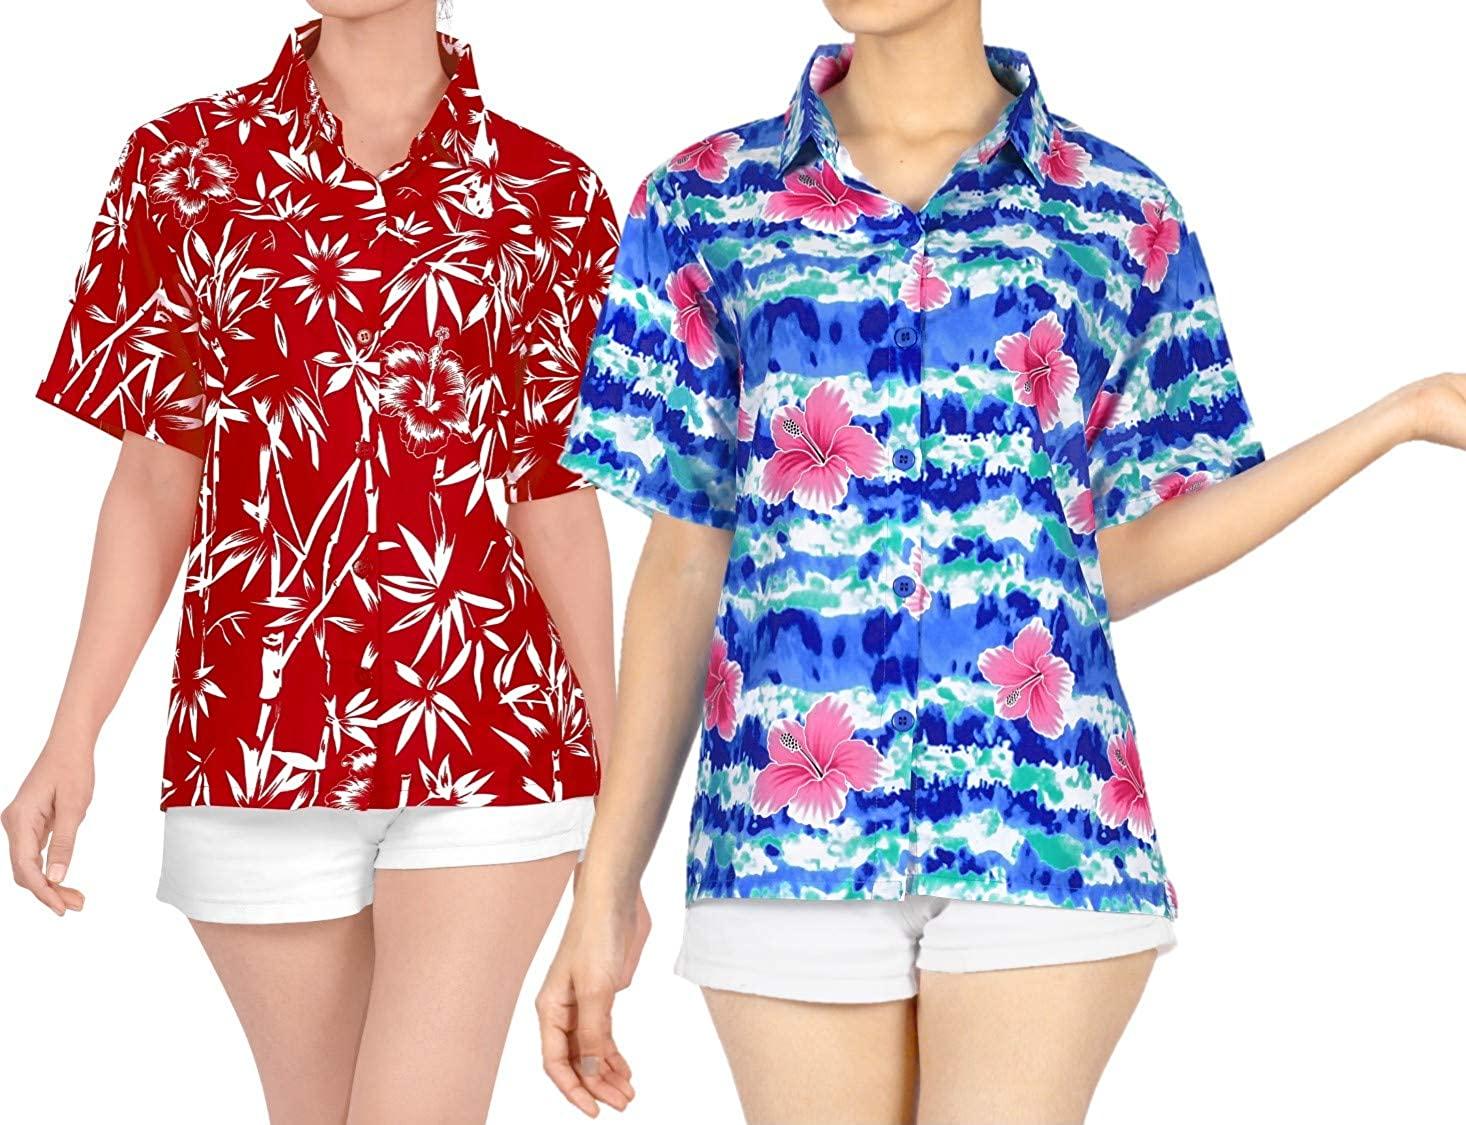 LA LEELA Women's Plus Size Golf Hawaiian Shirt Beach Camp Aloha Shirt Work from Home Clothes Women Beach Shirt Blouse Shirt Combo Pack of 2 Size XL